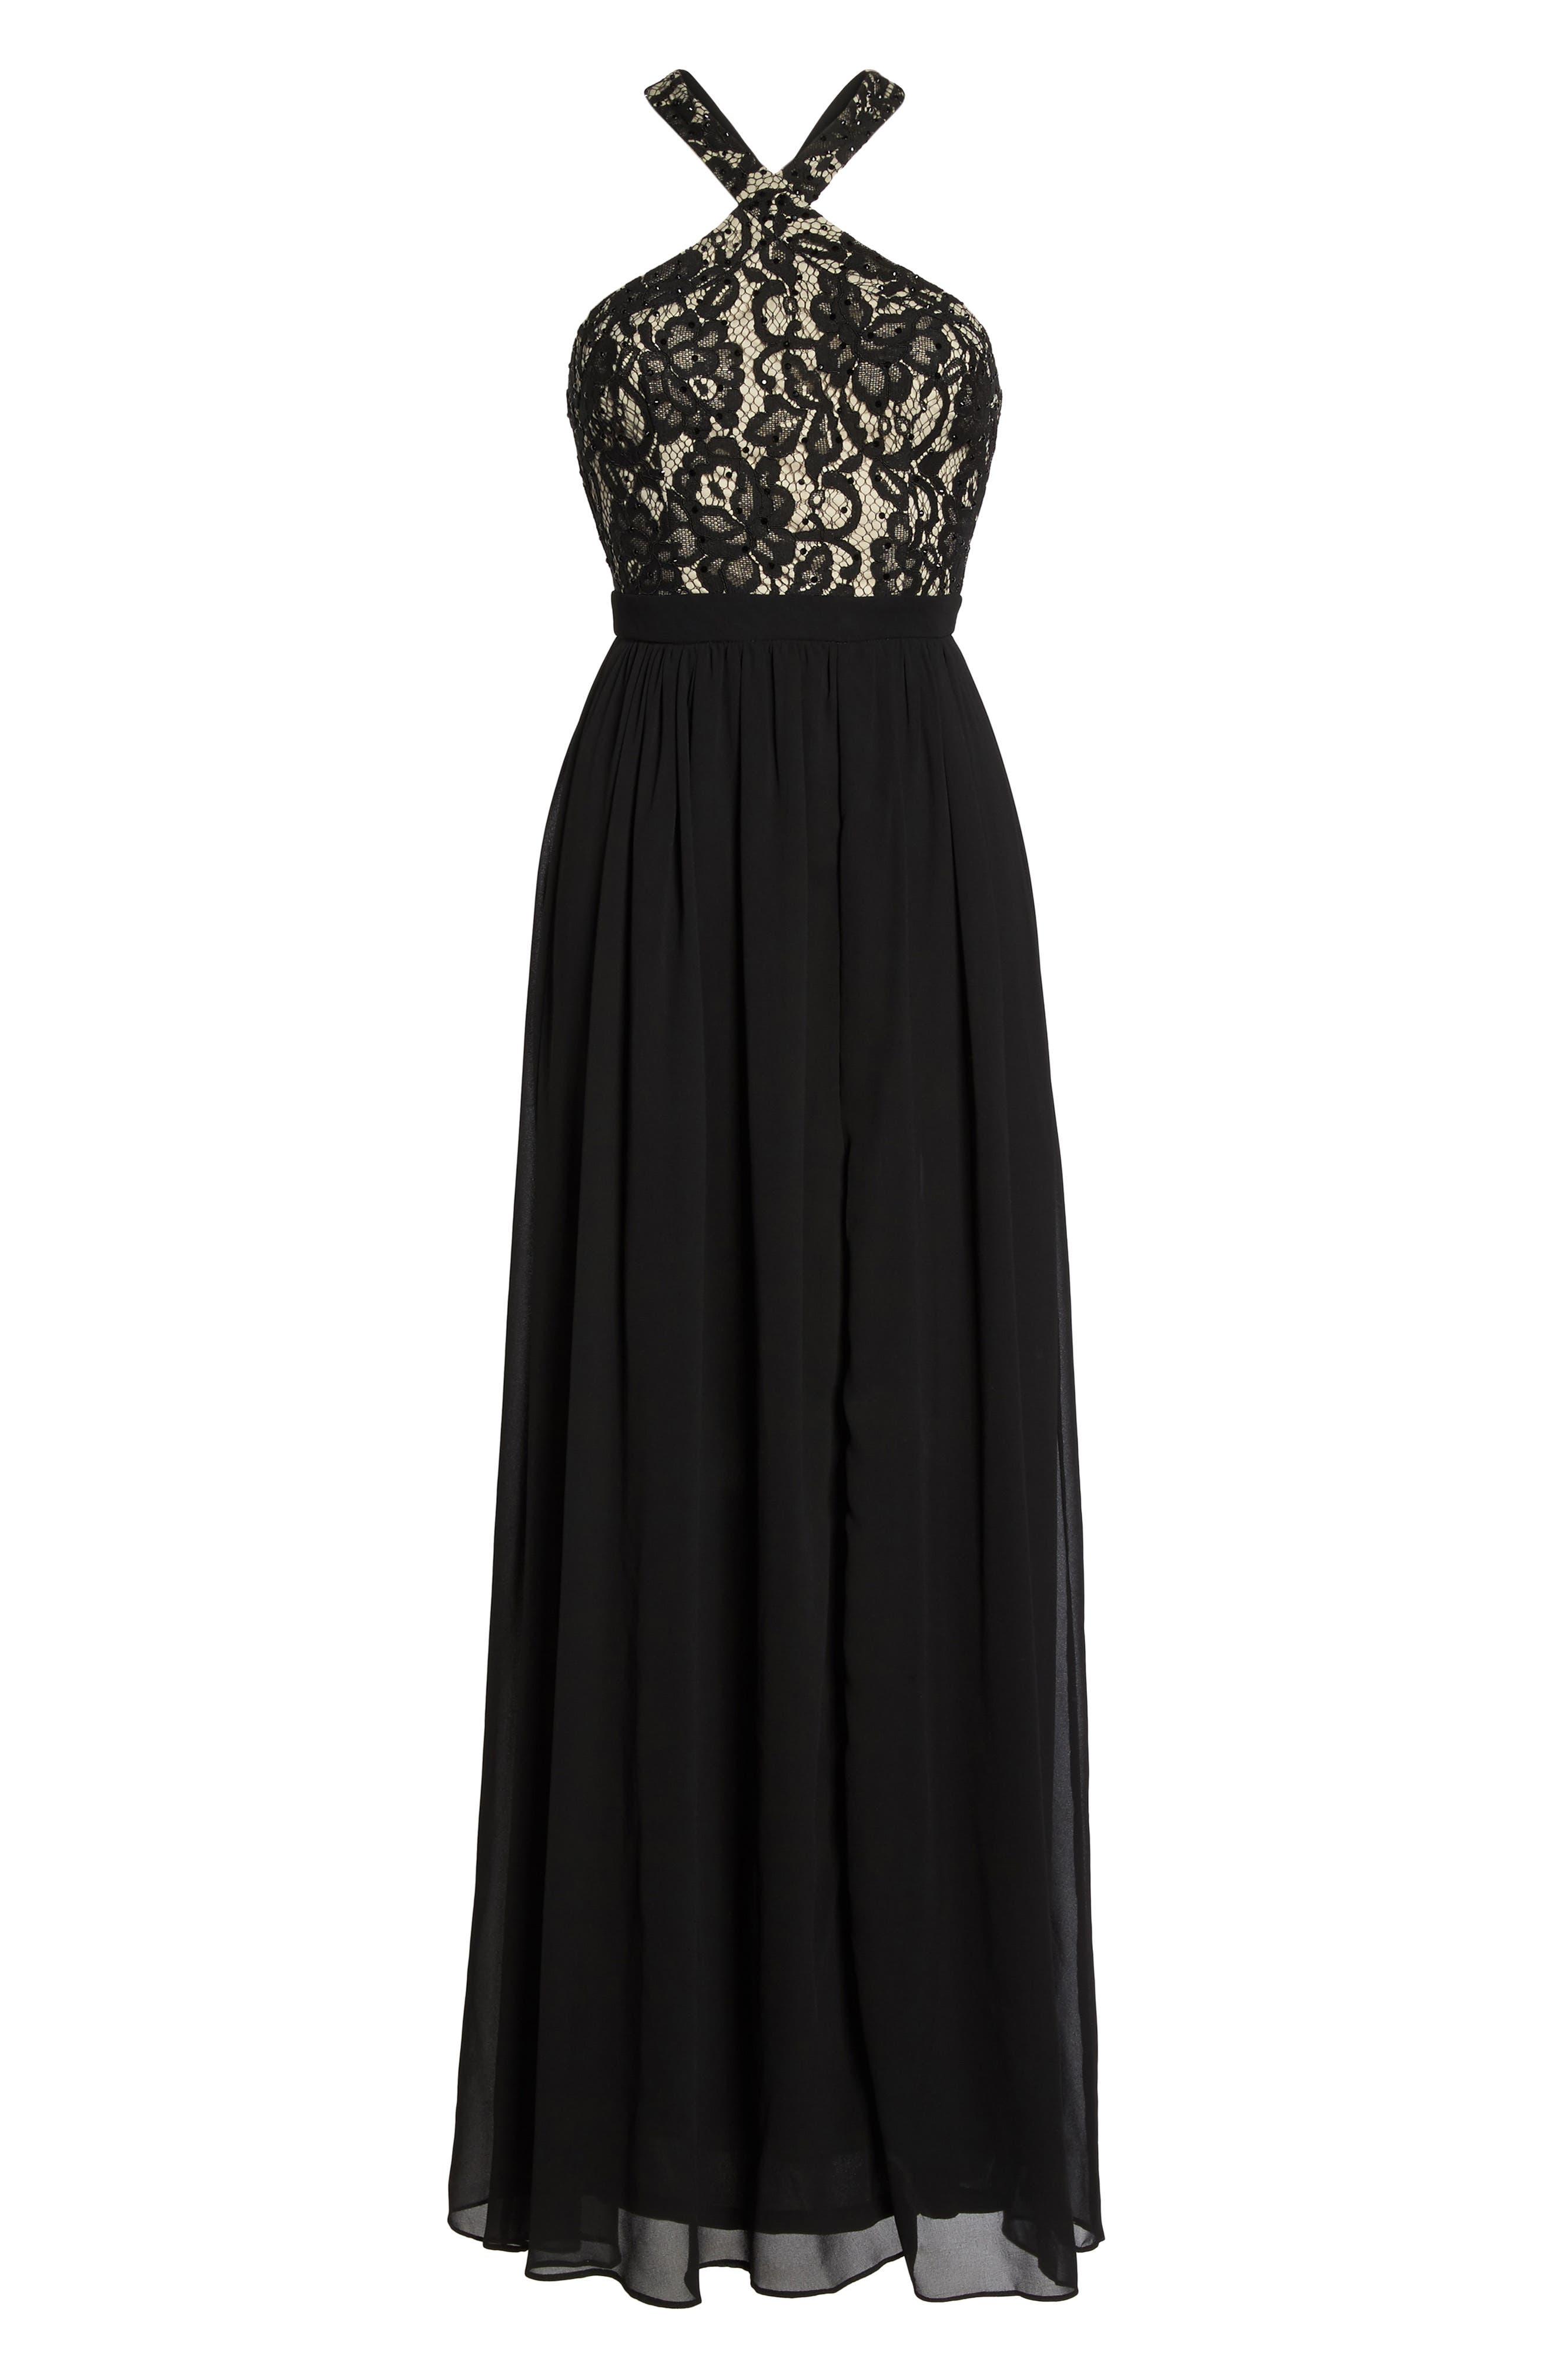 Sequin Lace & Chiffon Halter Gown,                             Alternate thumbnail 7, color,                             BLACK/ NUDE